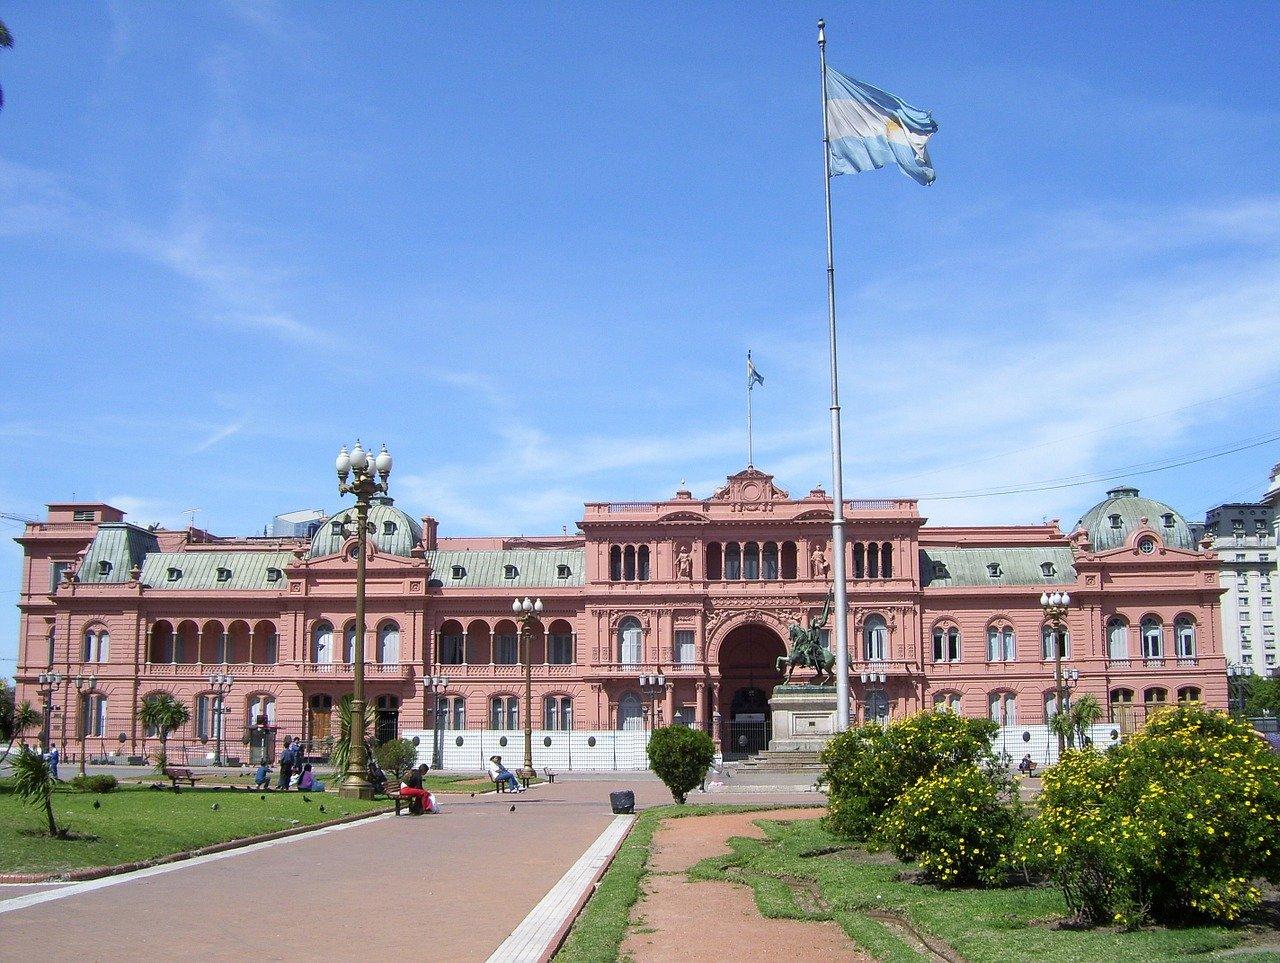 Buenos Aires na primavera